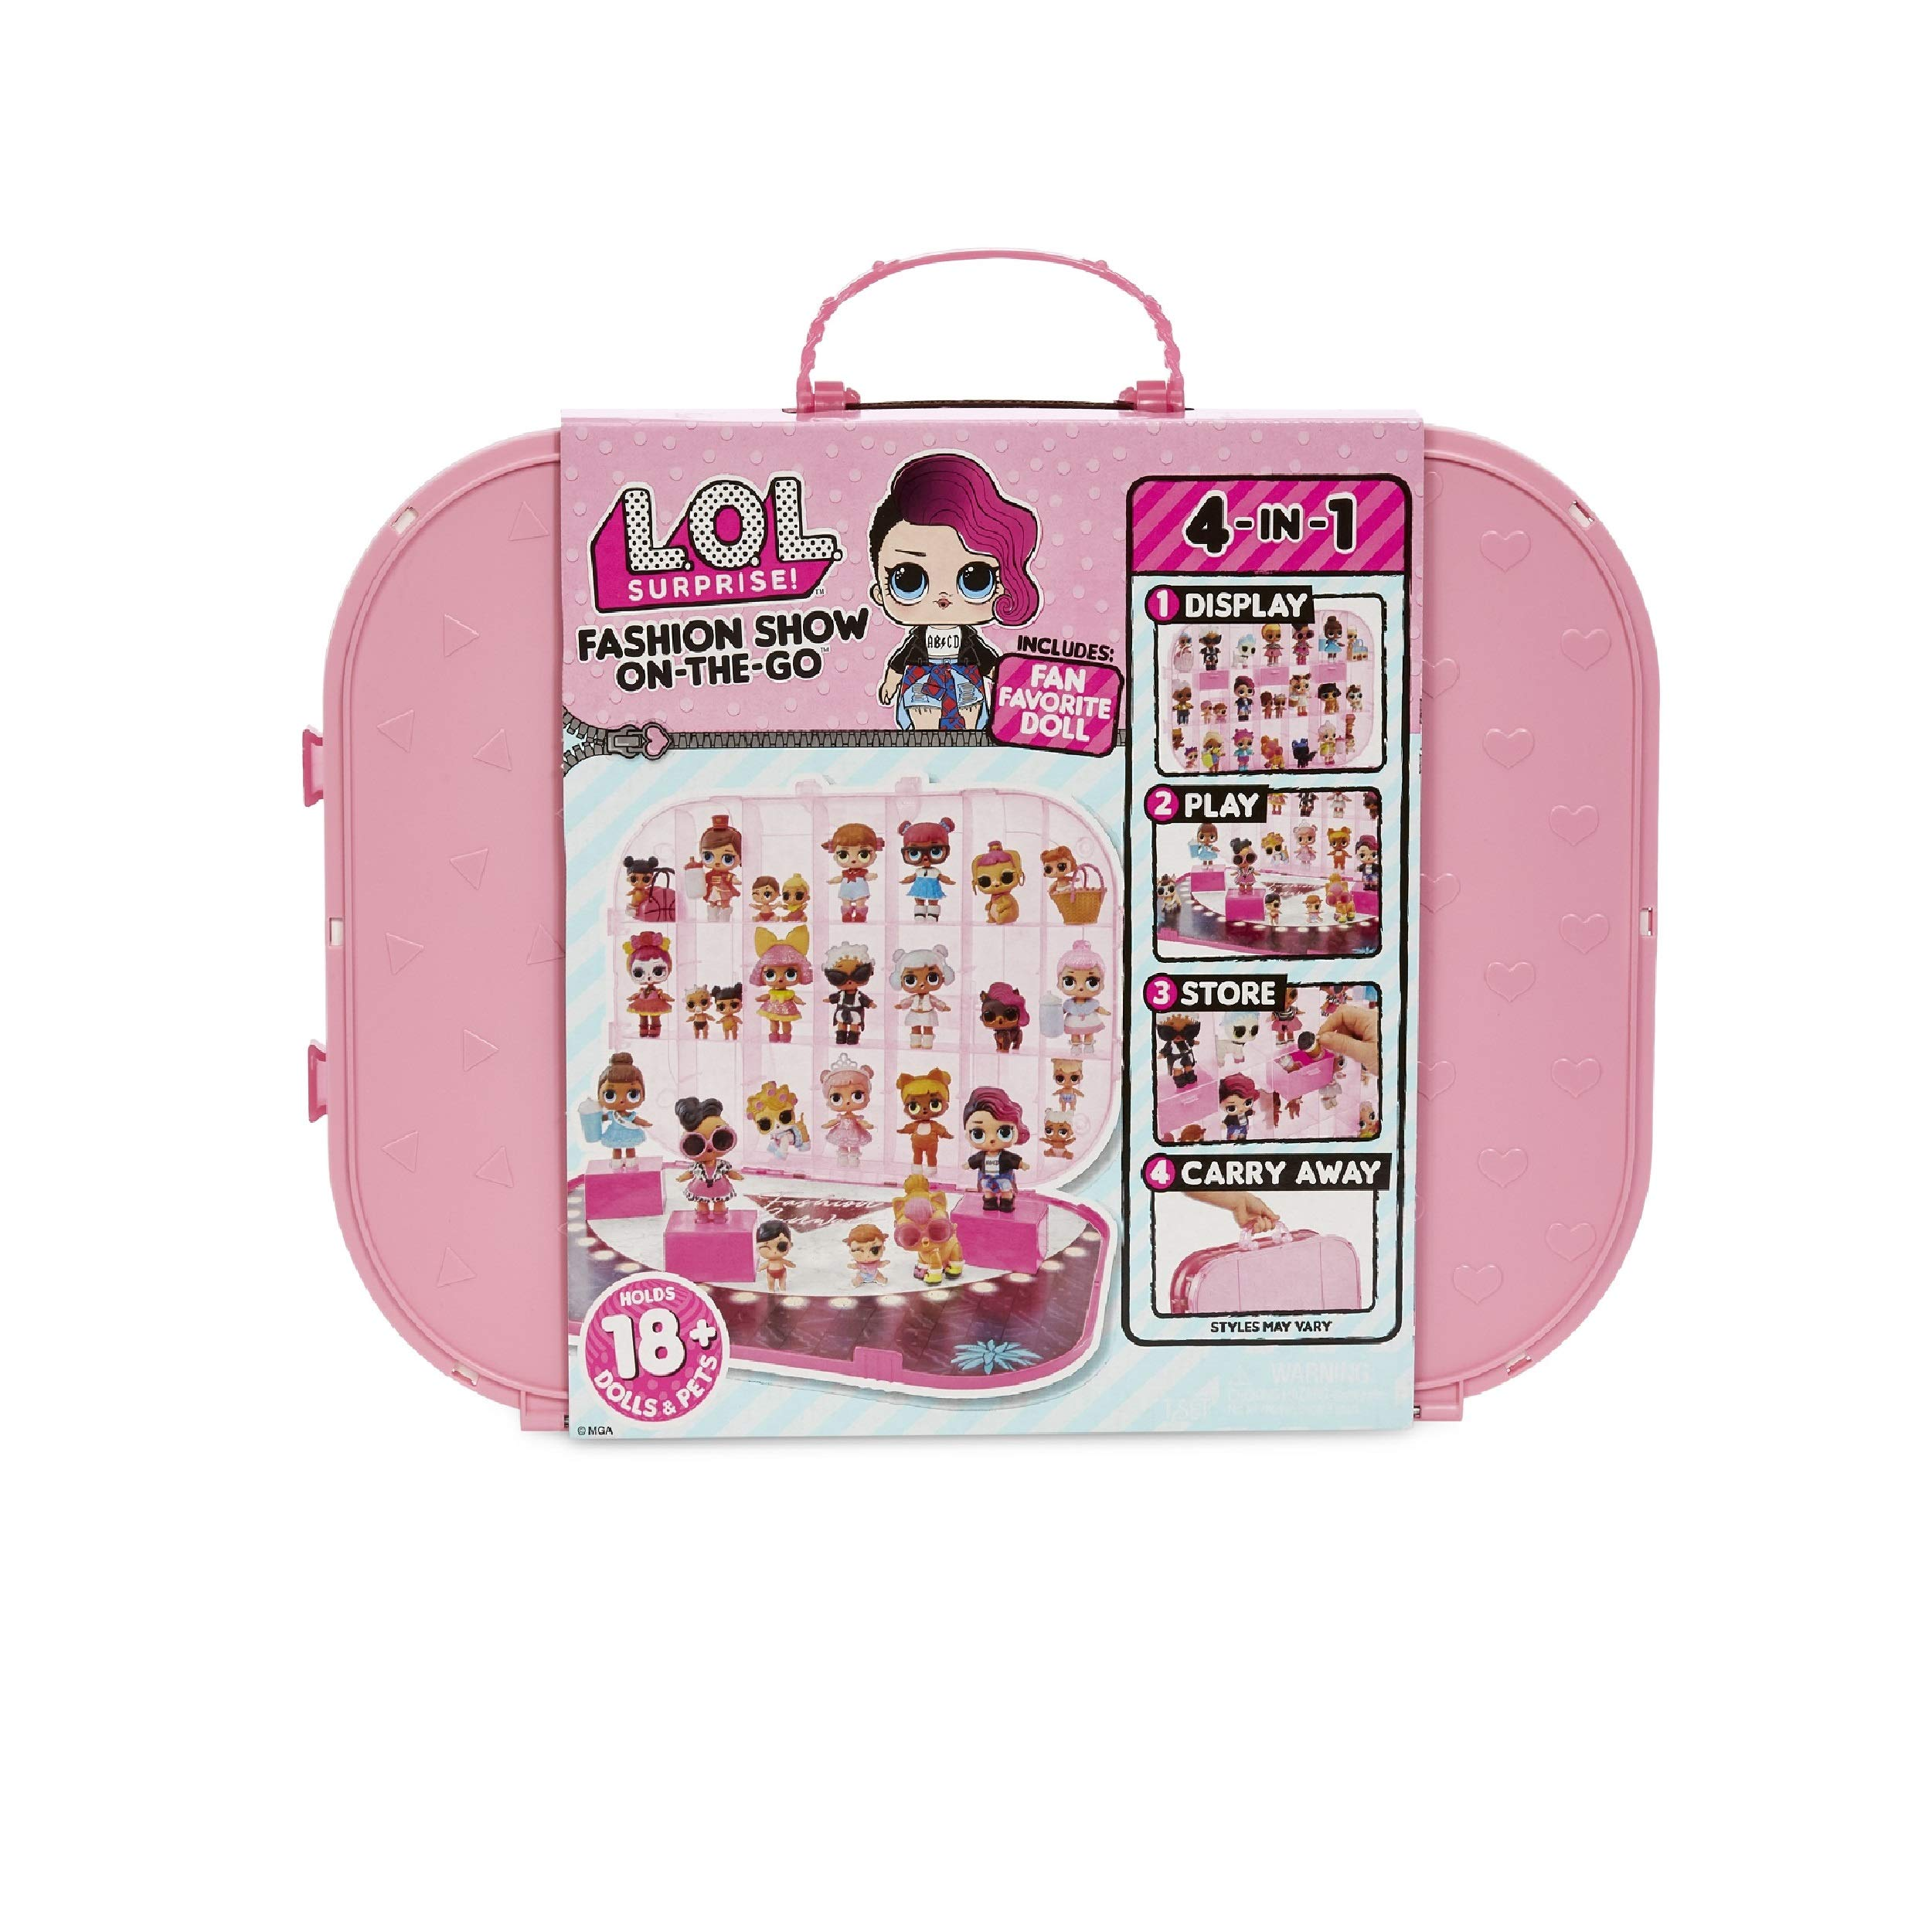 L.O.L 서프라이즈 패션쇼 온더고 플레이 세트 L.O.L Surprise! Fashion Show On-The-Go Storage/Playset with Doll Included